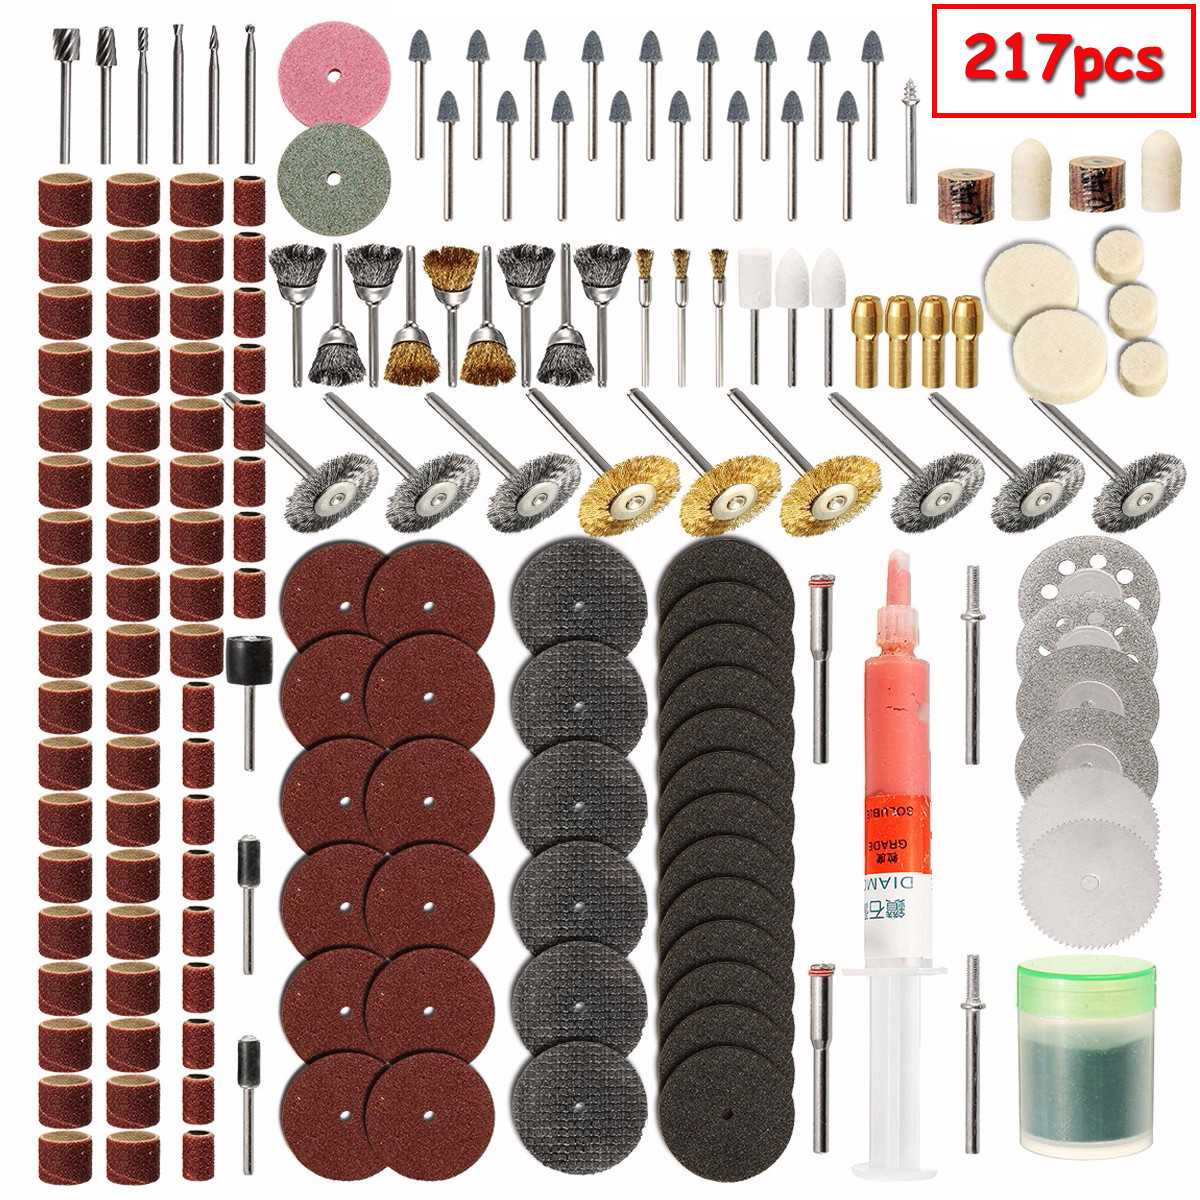 217Pcs/Set Electric Sanding Polish Accessory Bit Fits For Dremel Drill Grinding Cutting Polishing Dremel Power Tools Accessories